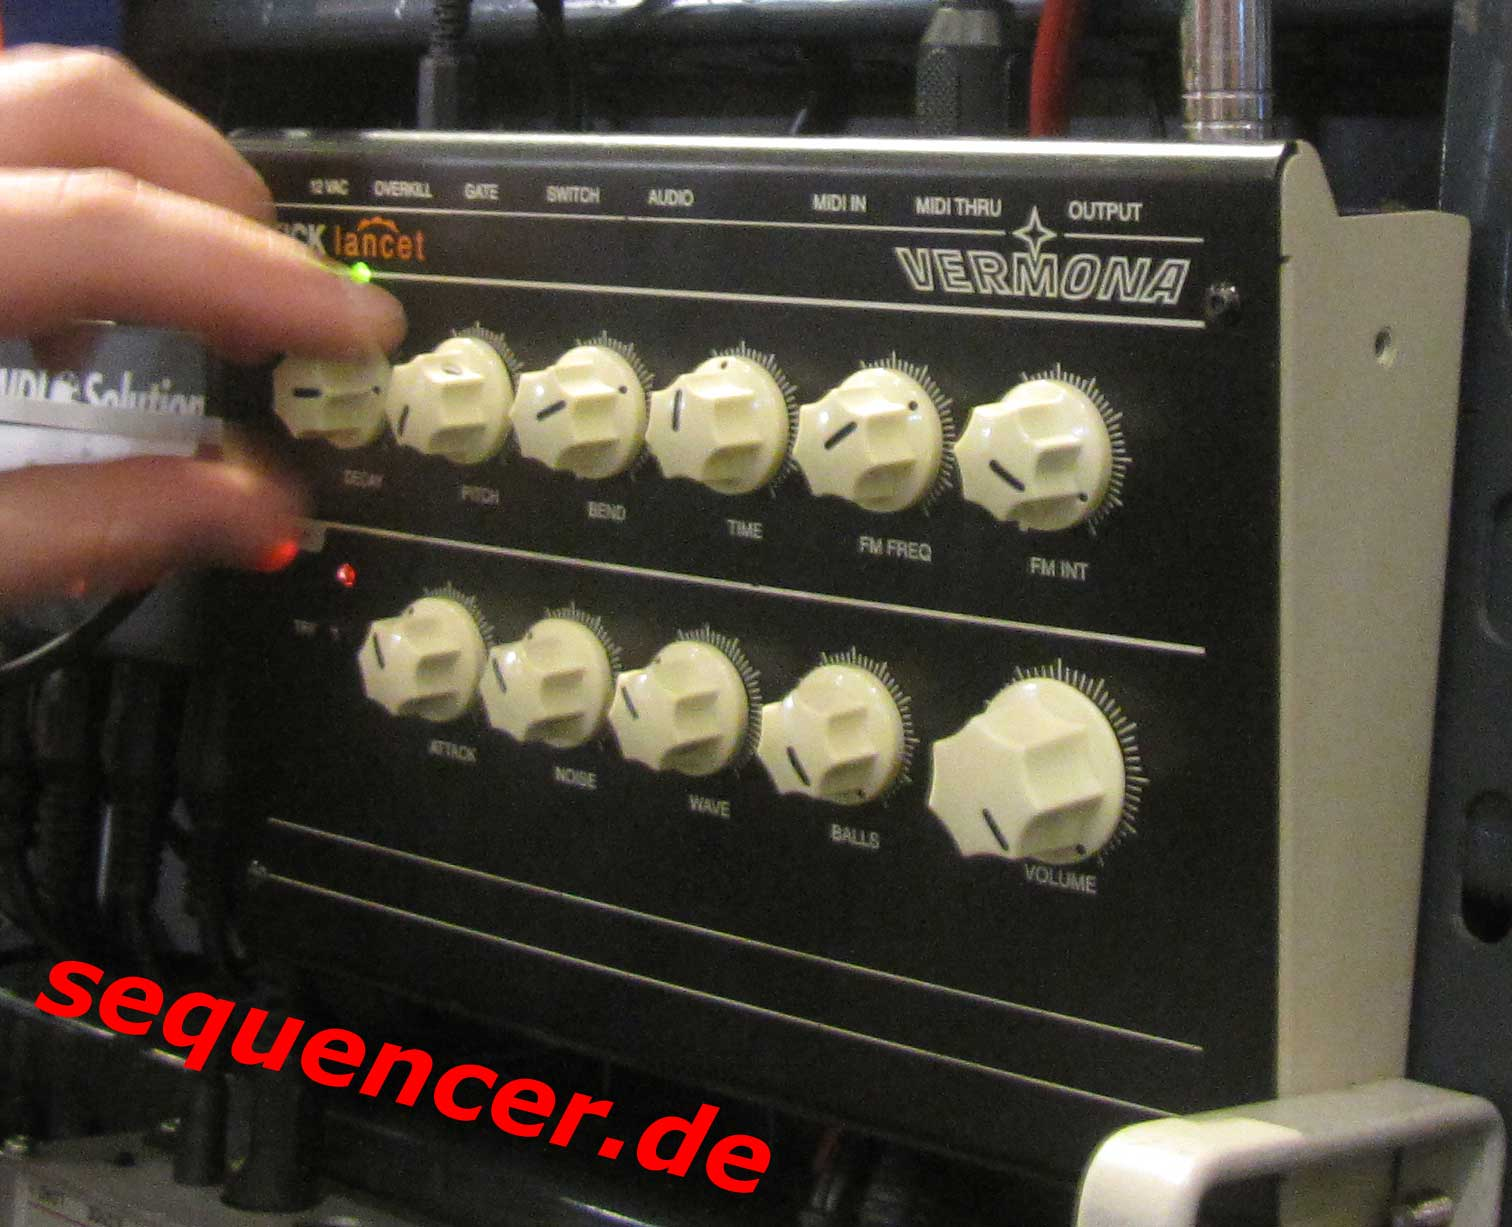 Vermona Kick Lancet synthesizer